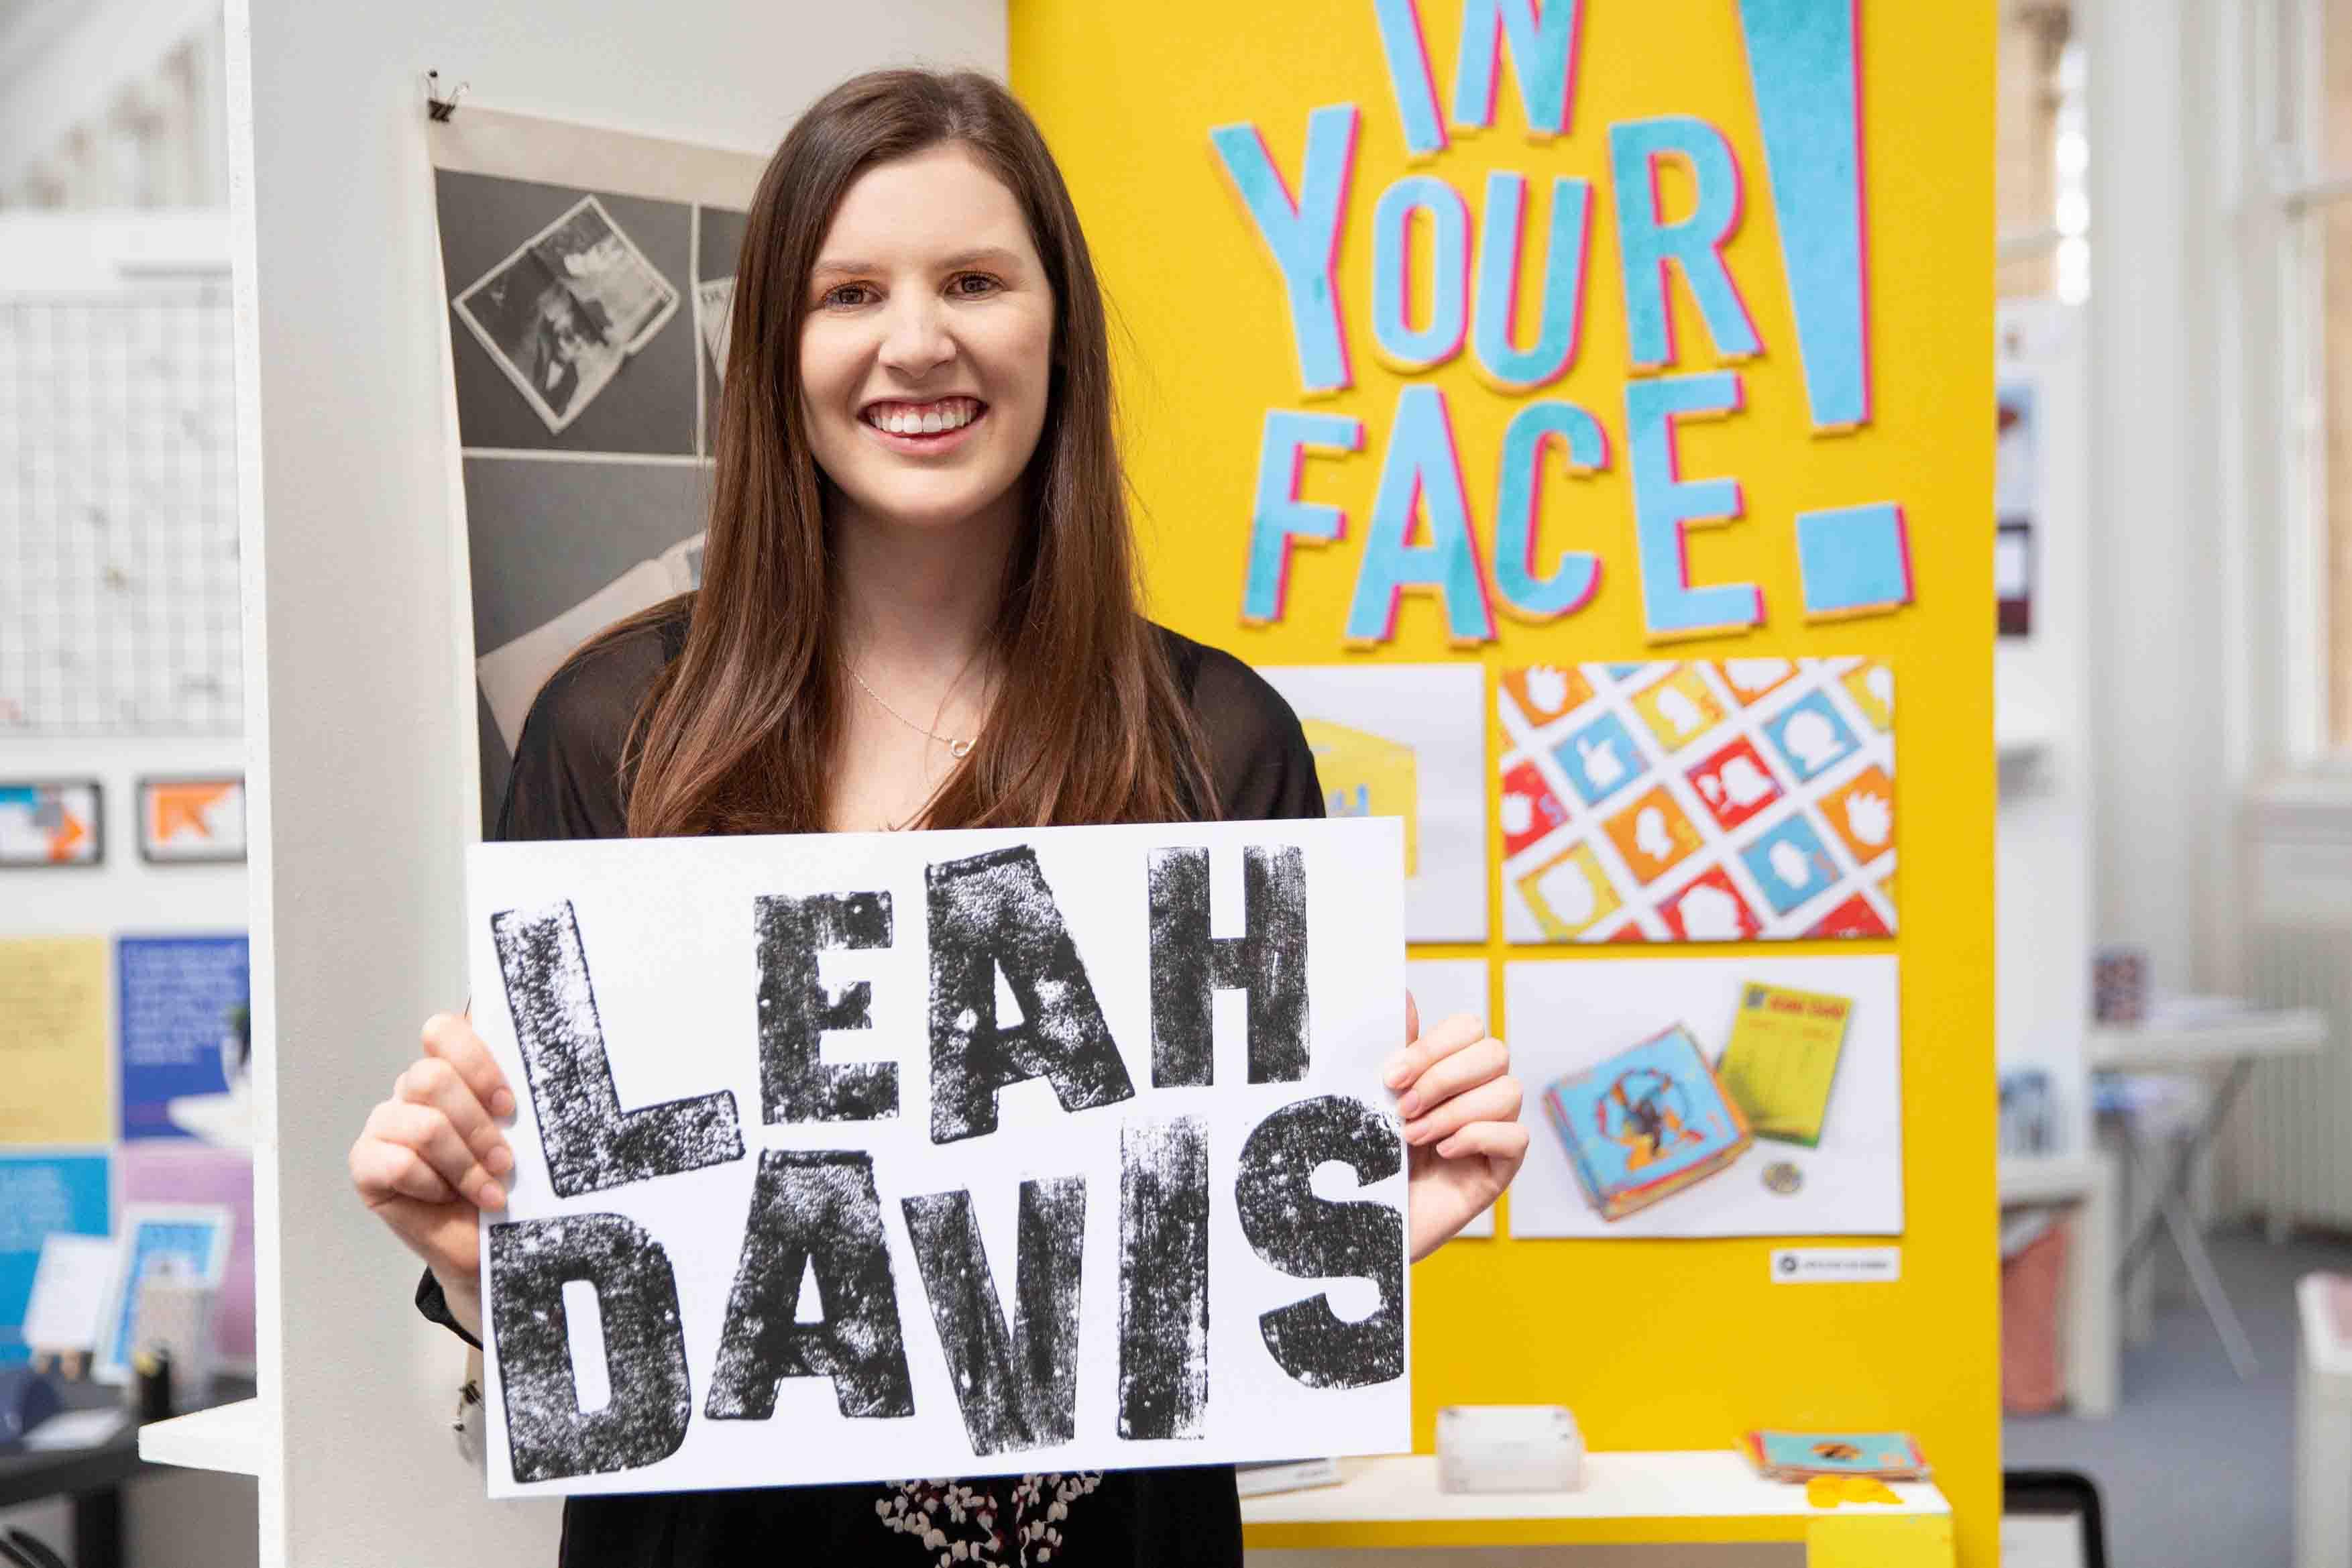 NTU student Leah Davis